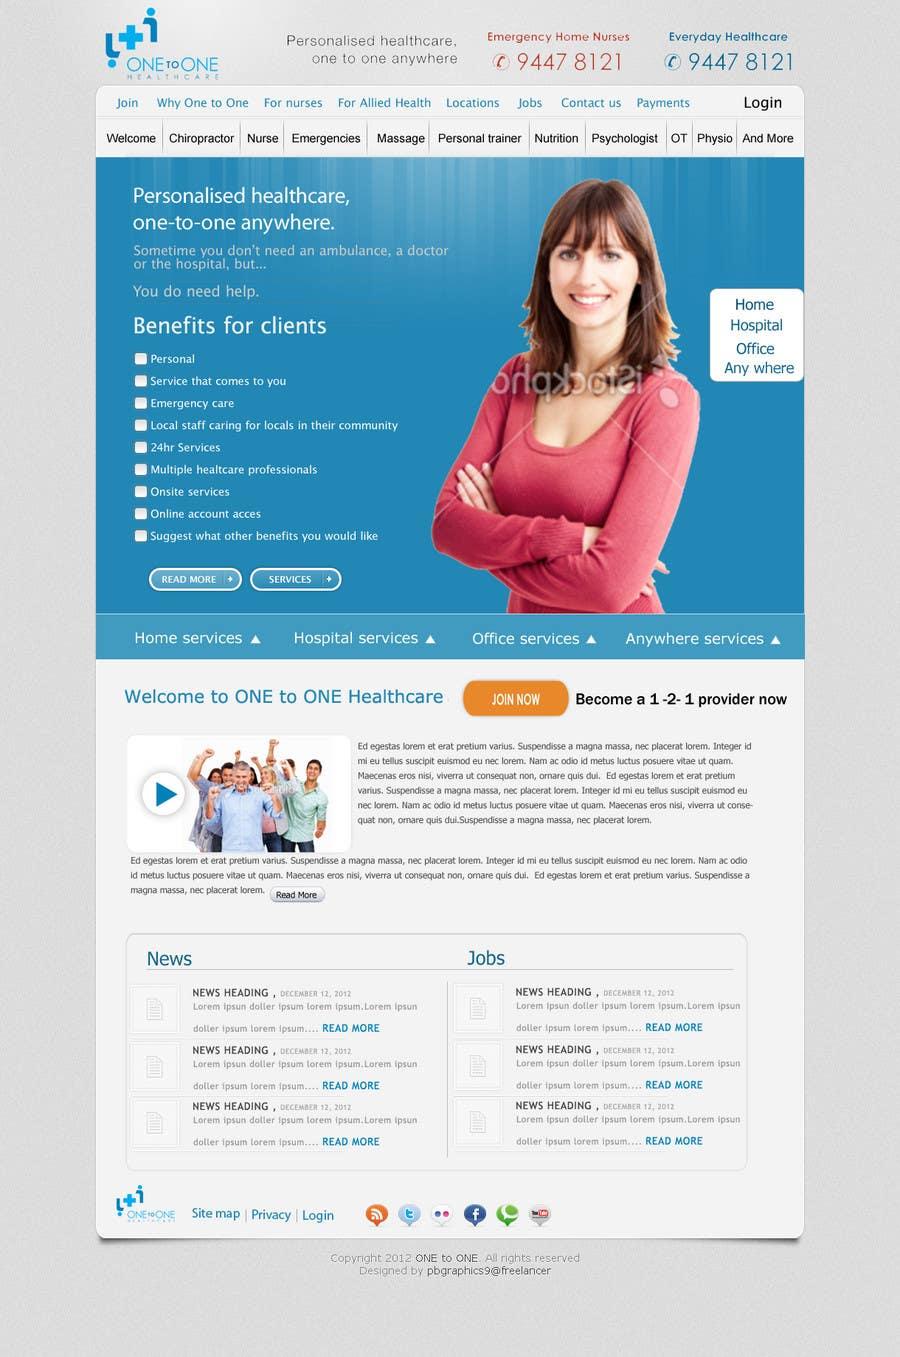 Konkurrenceindlæg #                                        107                                      for                                         WEBPAGE FINISH OFF Design based on already designed layout